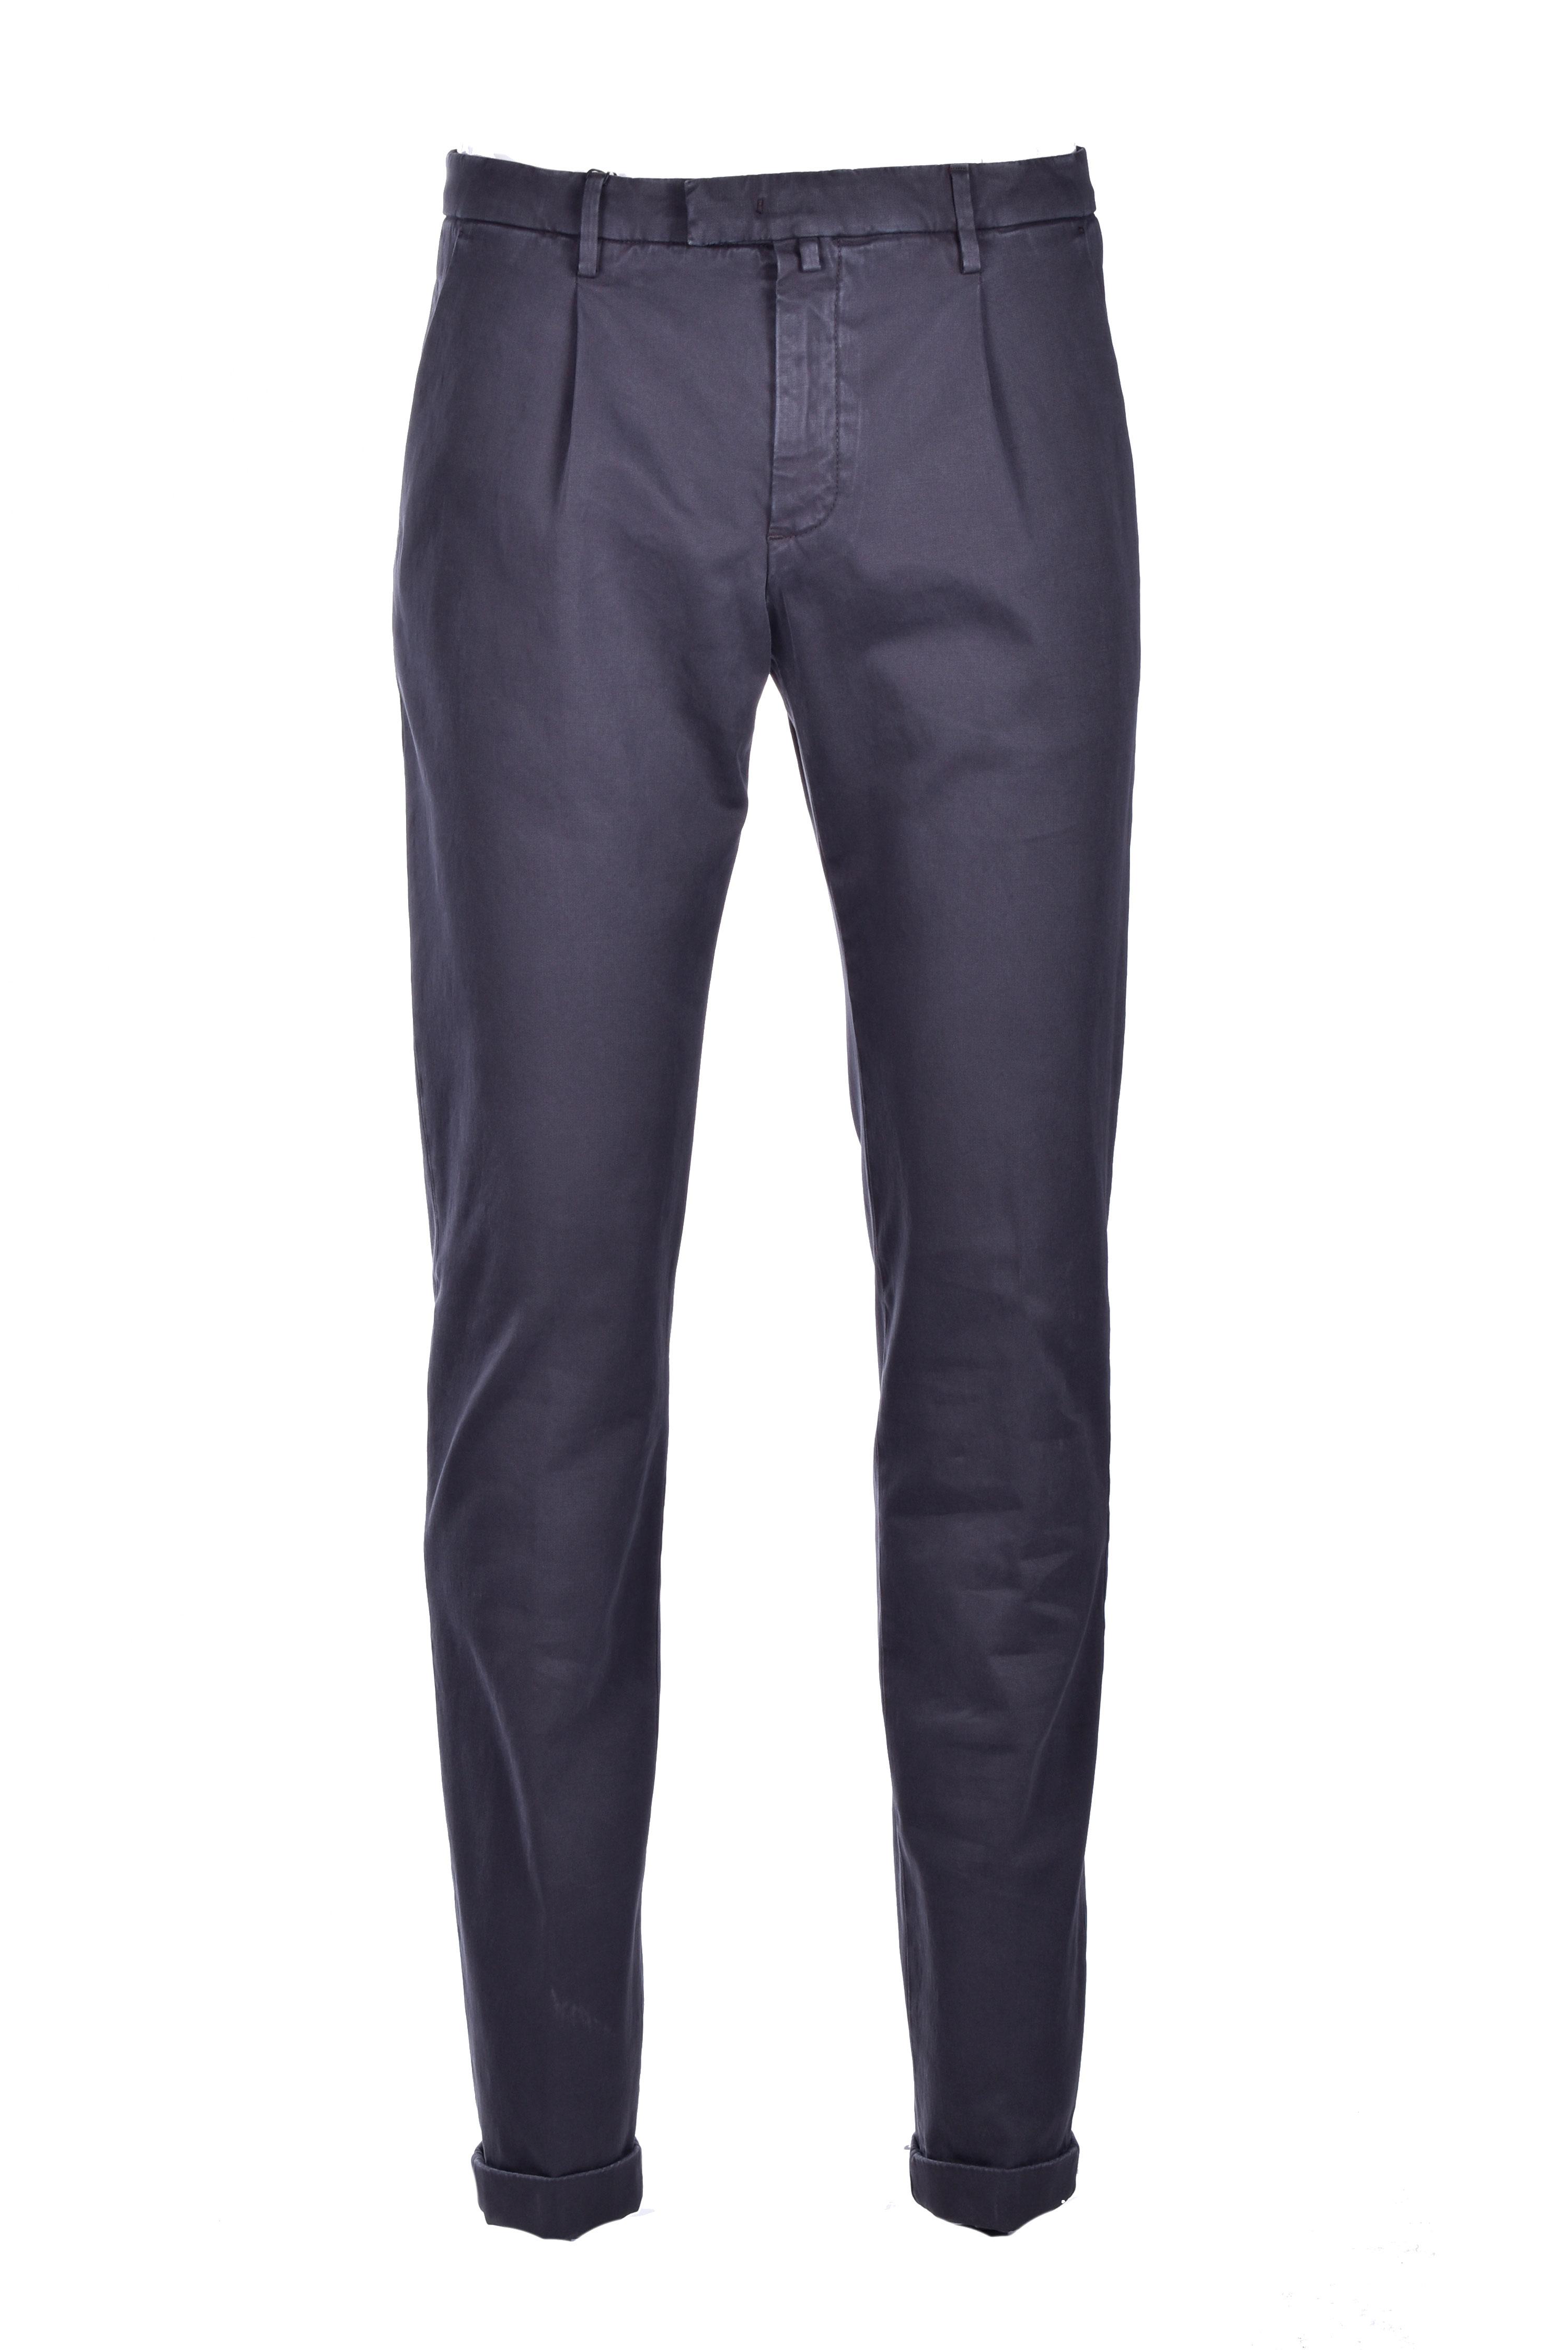 Cotton chino trousers - dark gray BRIGLIA   Pants   BG07 420557590